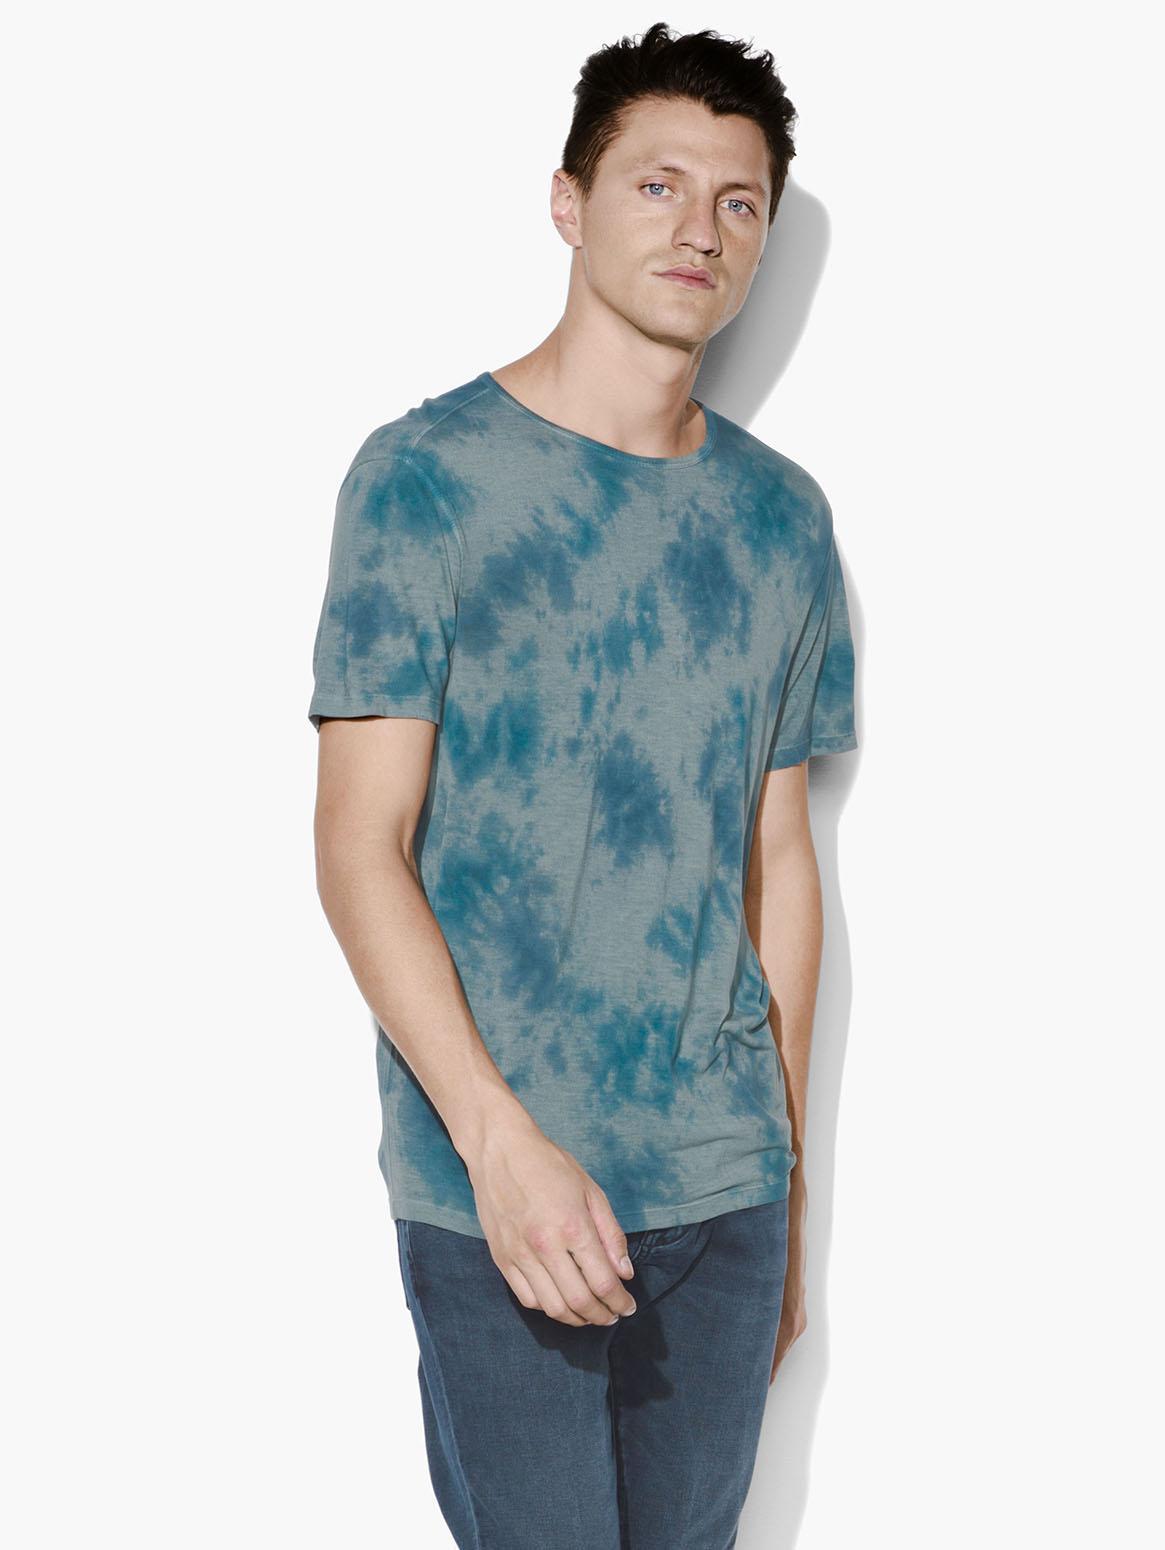 John Varvatos Men/'s Revolution Tie Dye Raw Edge Graphic Crew T-Shirt Blue Black